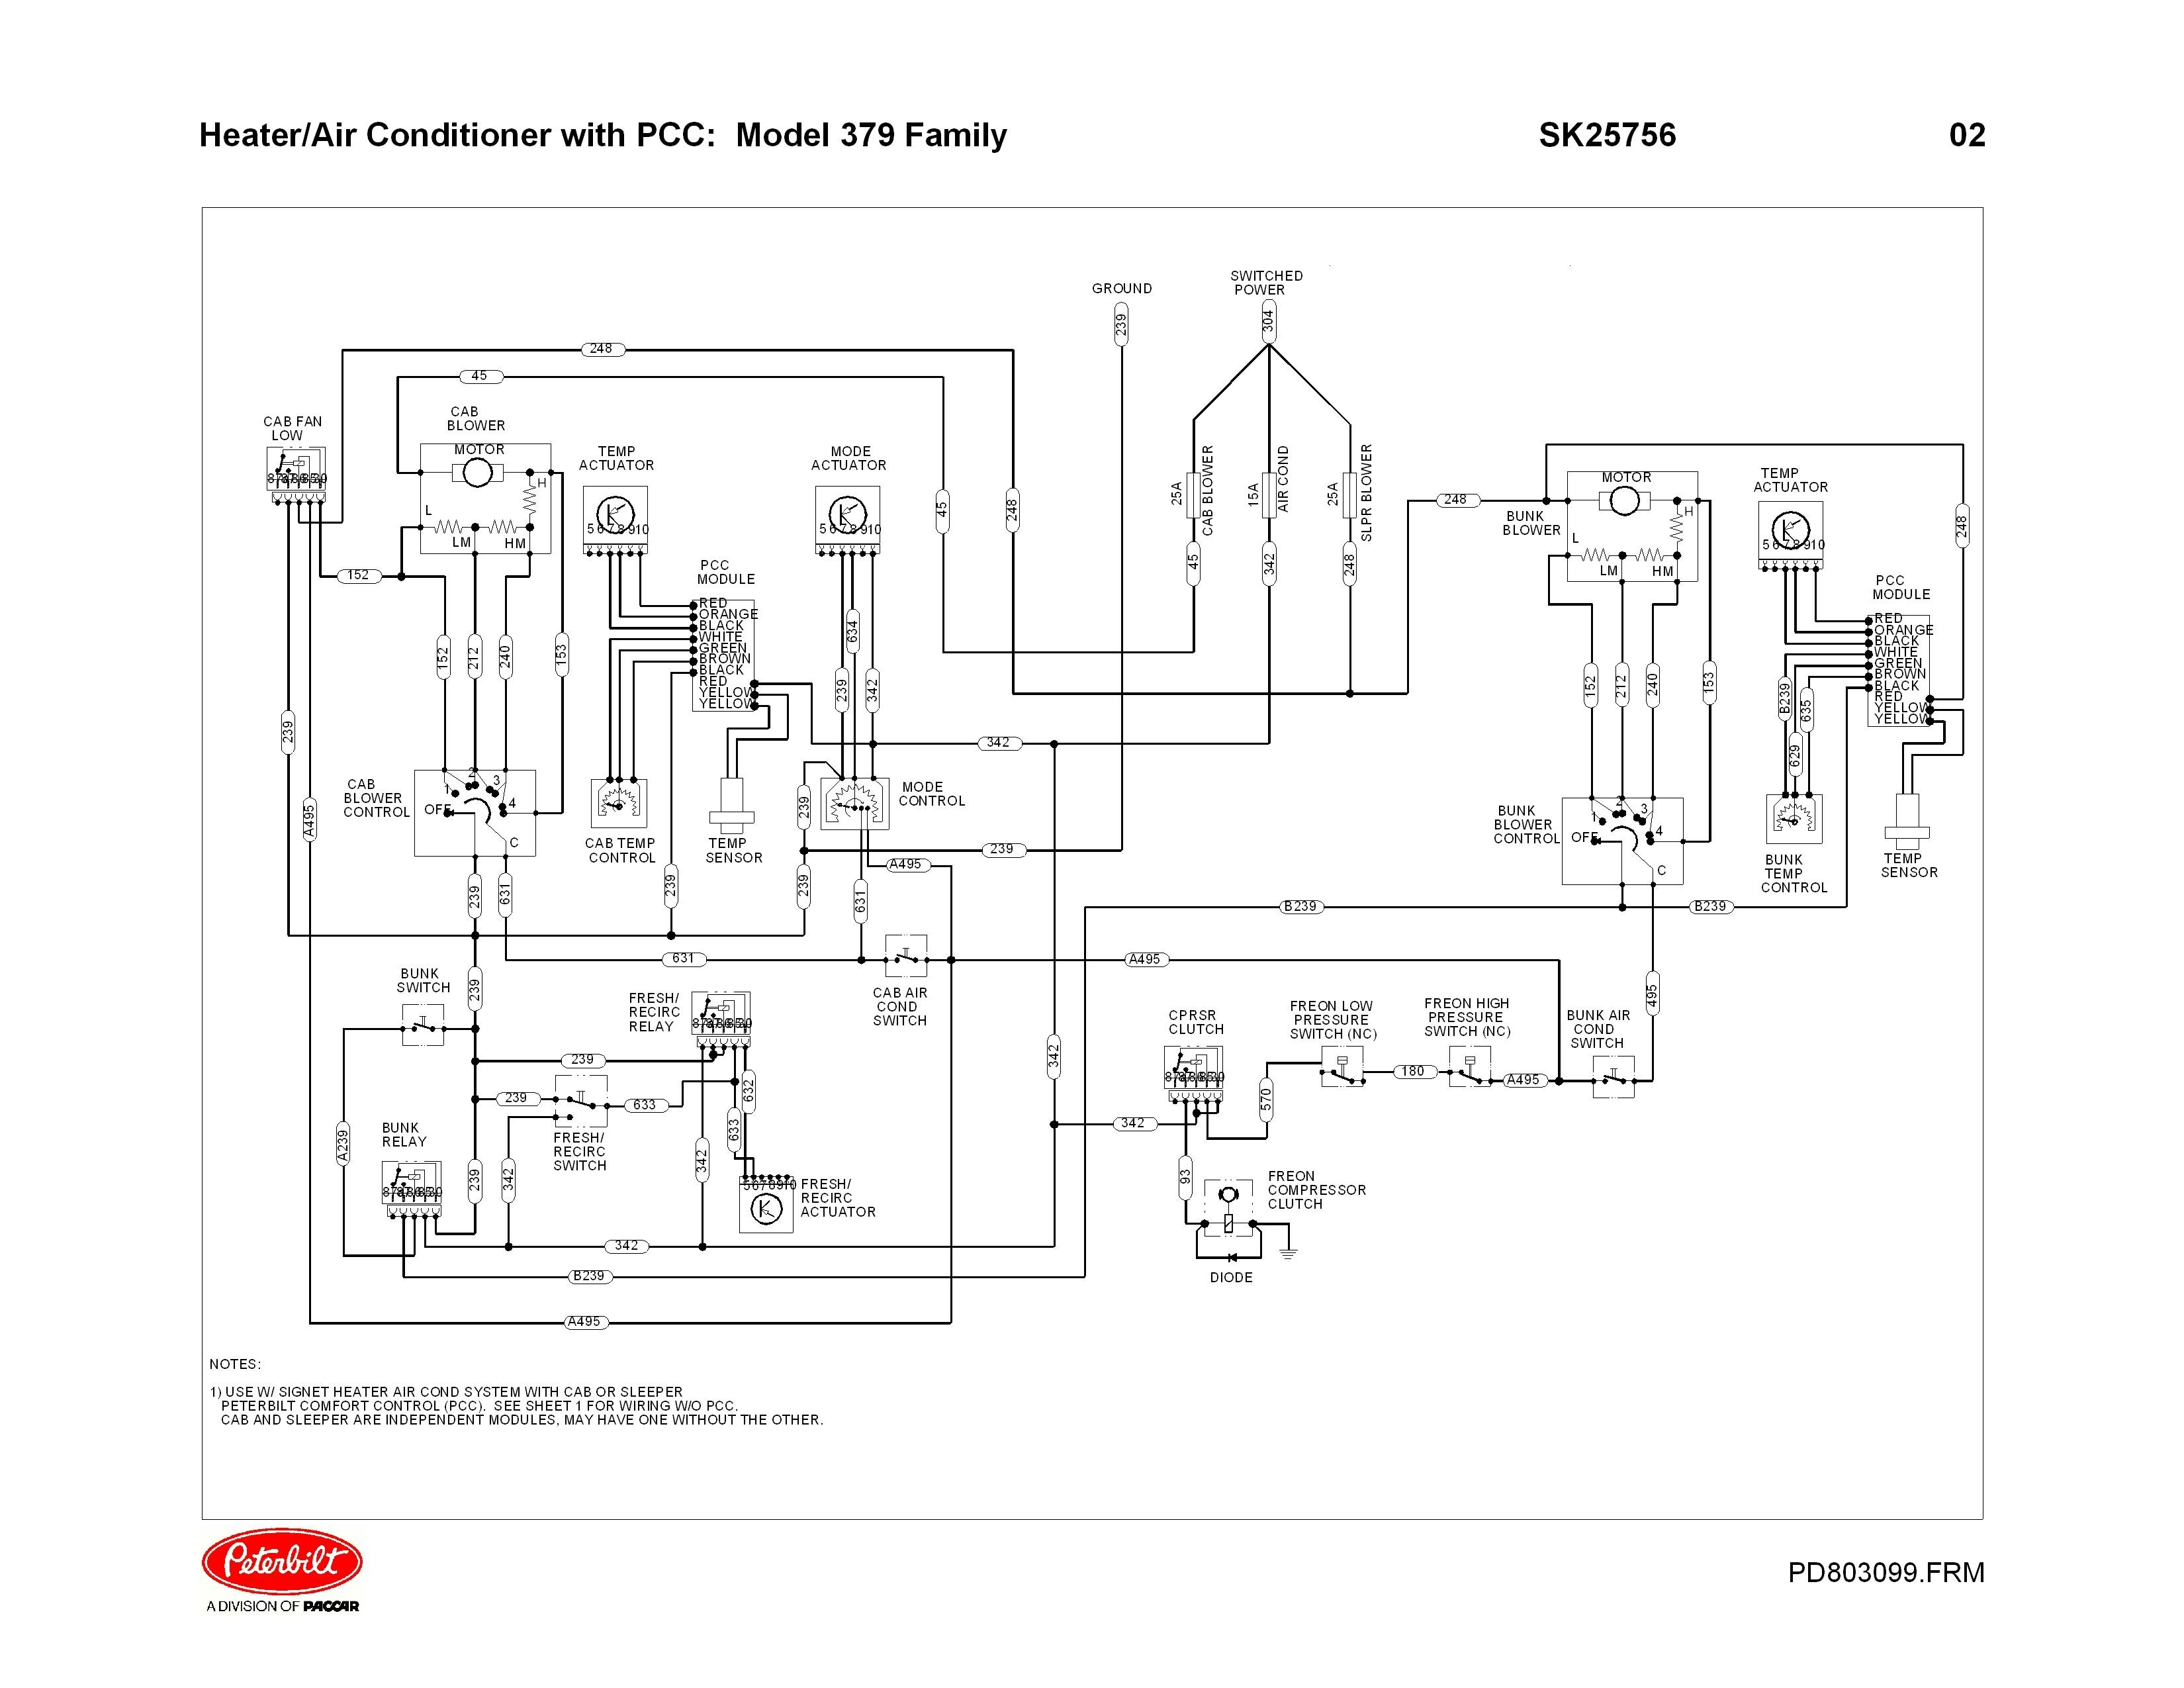 2009 kenworth w900 headlight wiring diagram 1988 kw w900 wiring diagram mari aceh tintenglueck de  1988 kw w900 wiring diagram mari aceh